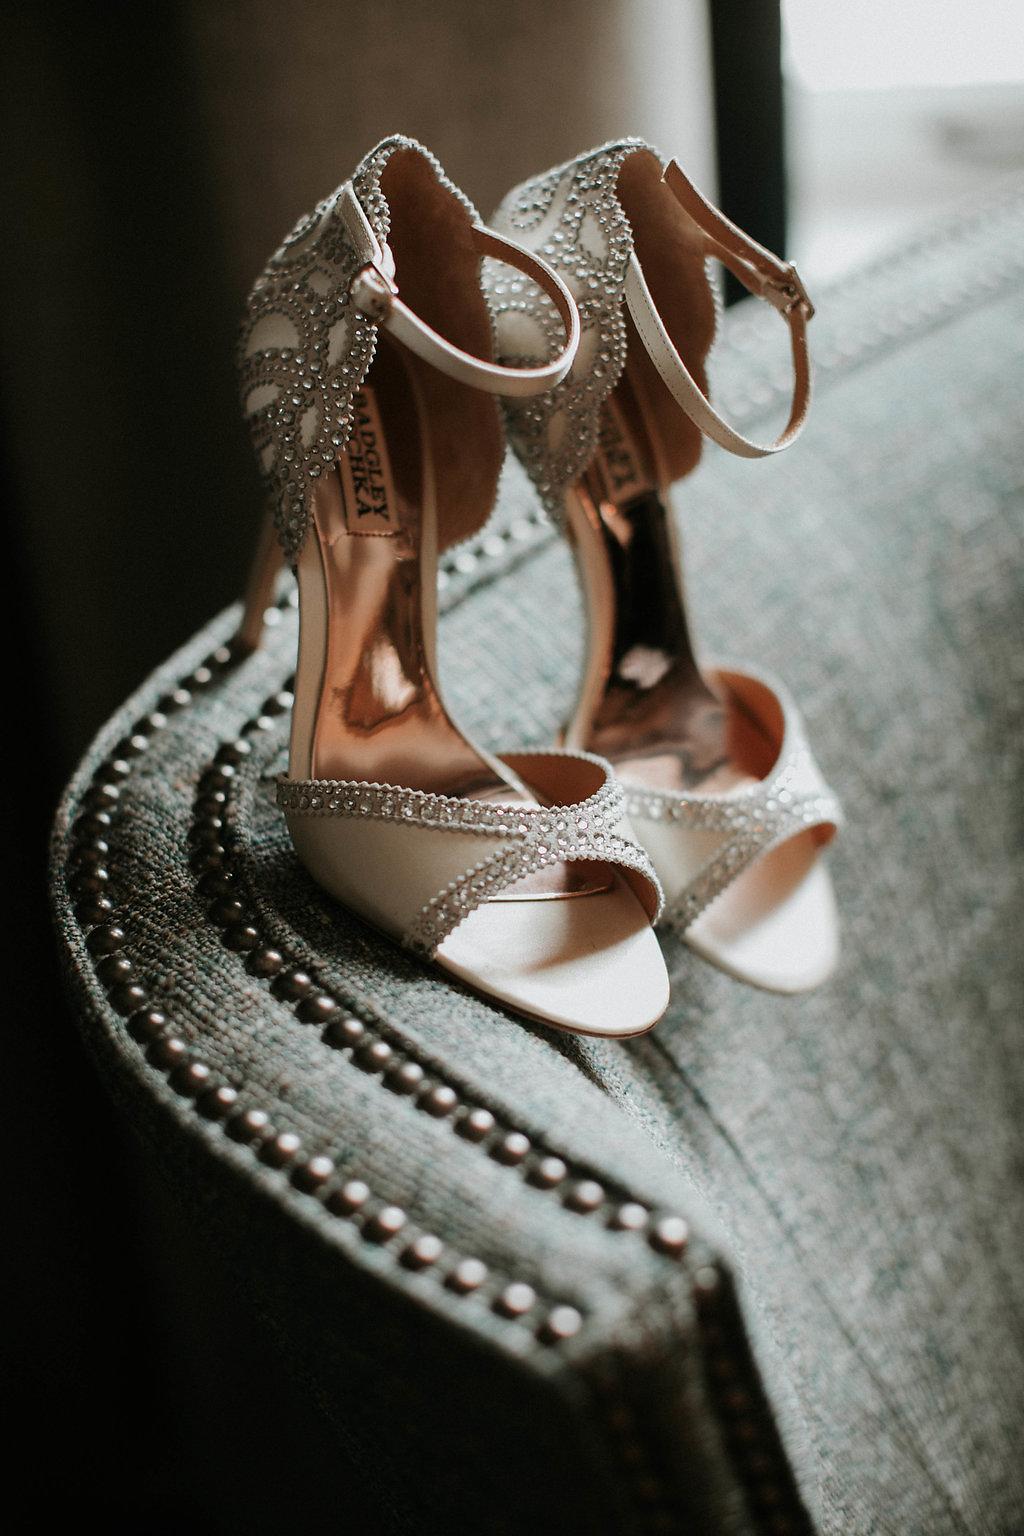 Woodway_Seattle_Wedding_Mark+Patricia_by_Adina_Preston_Weddings_536.JPG